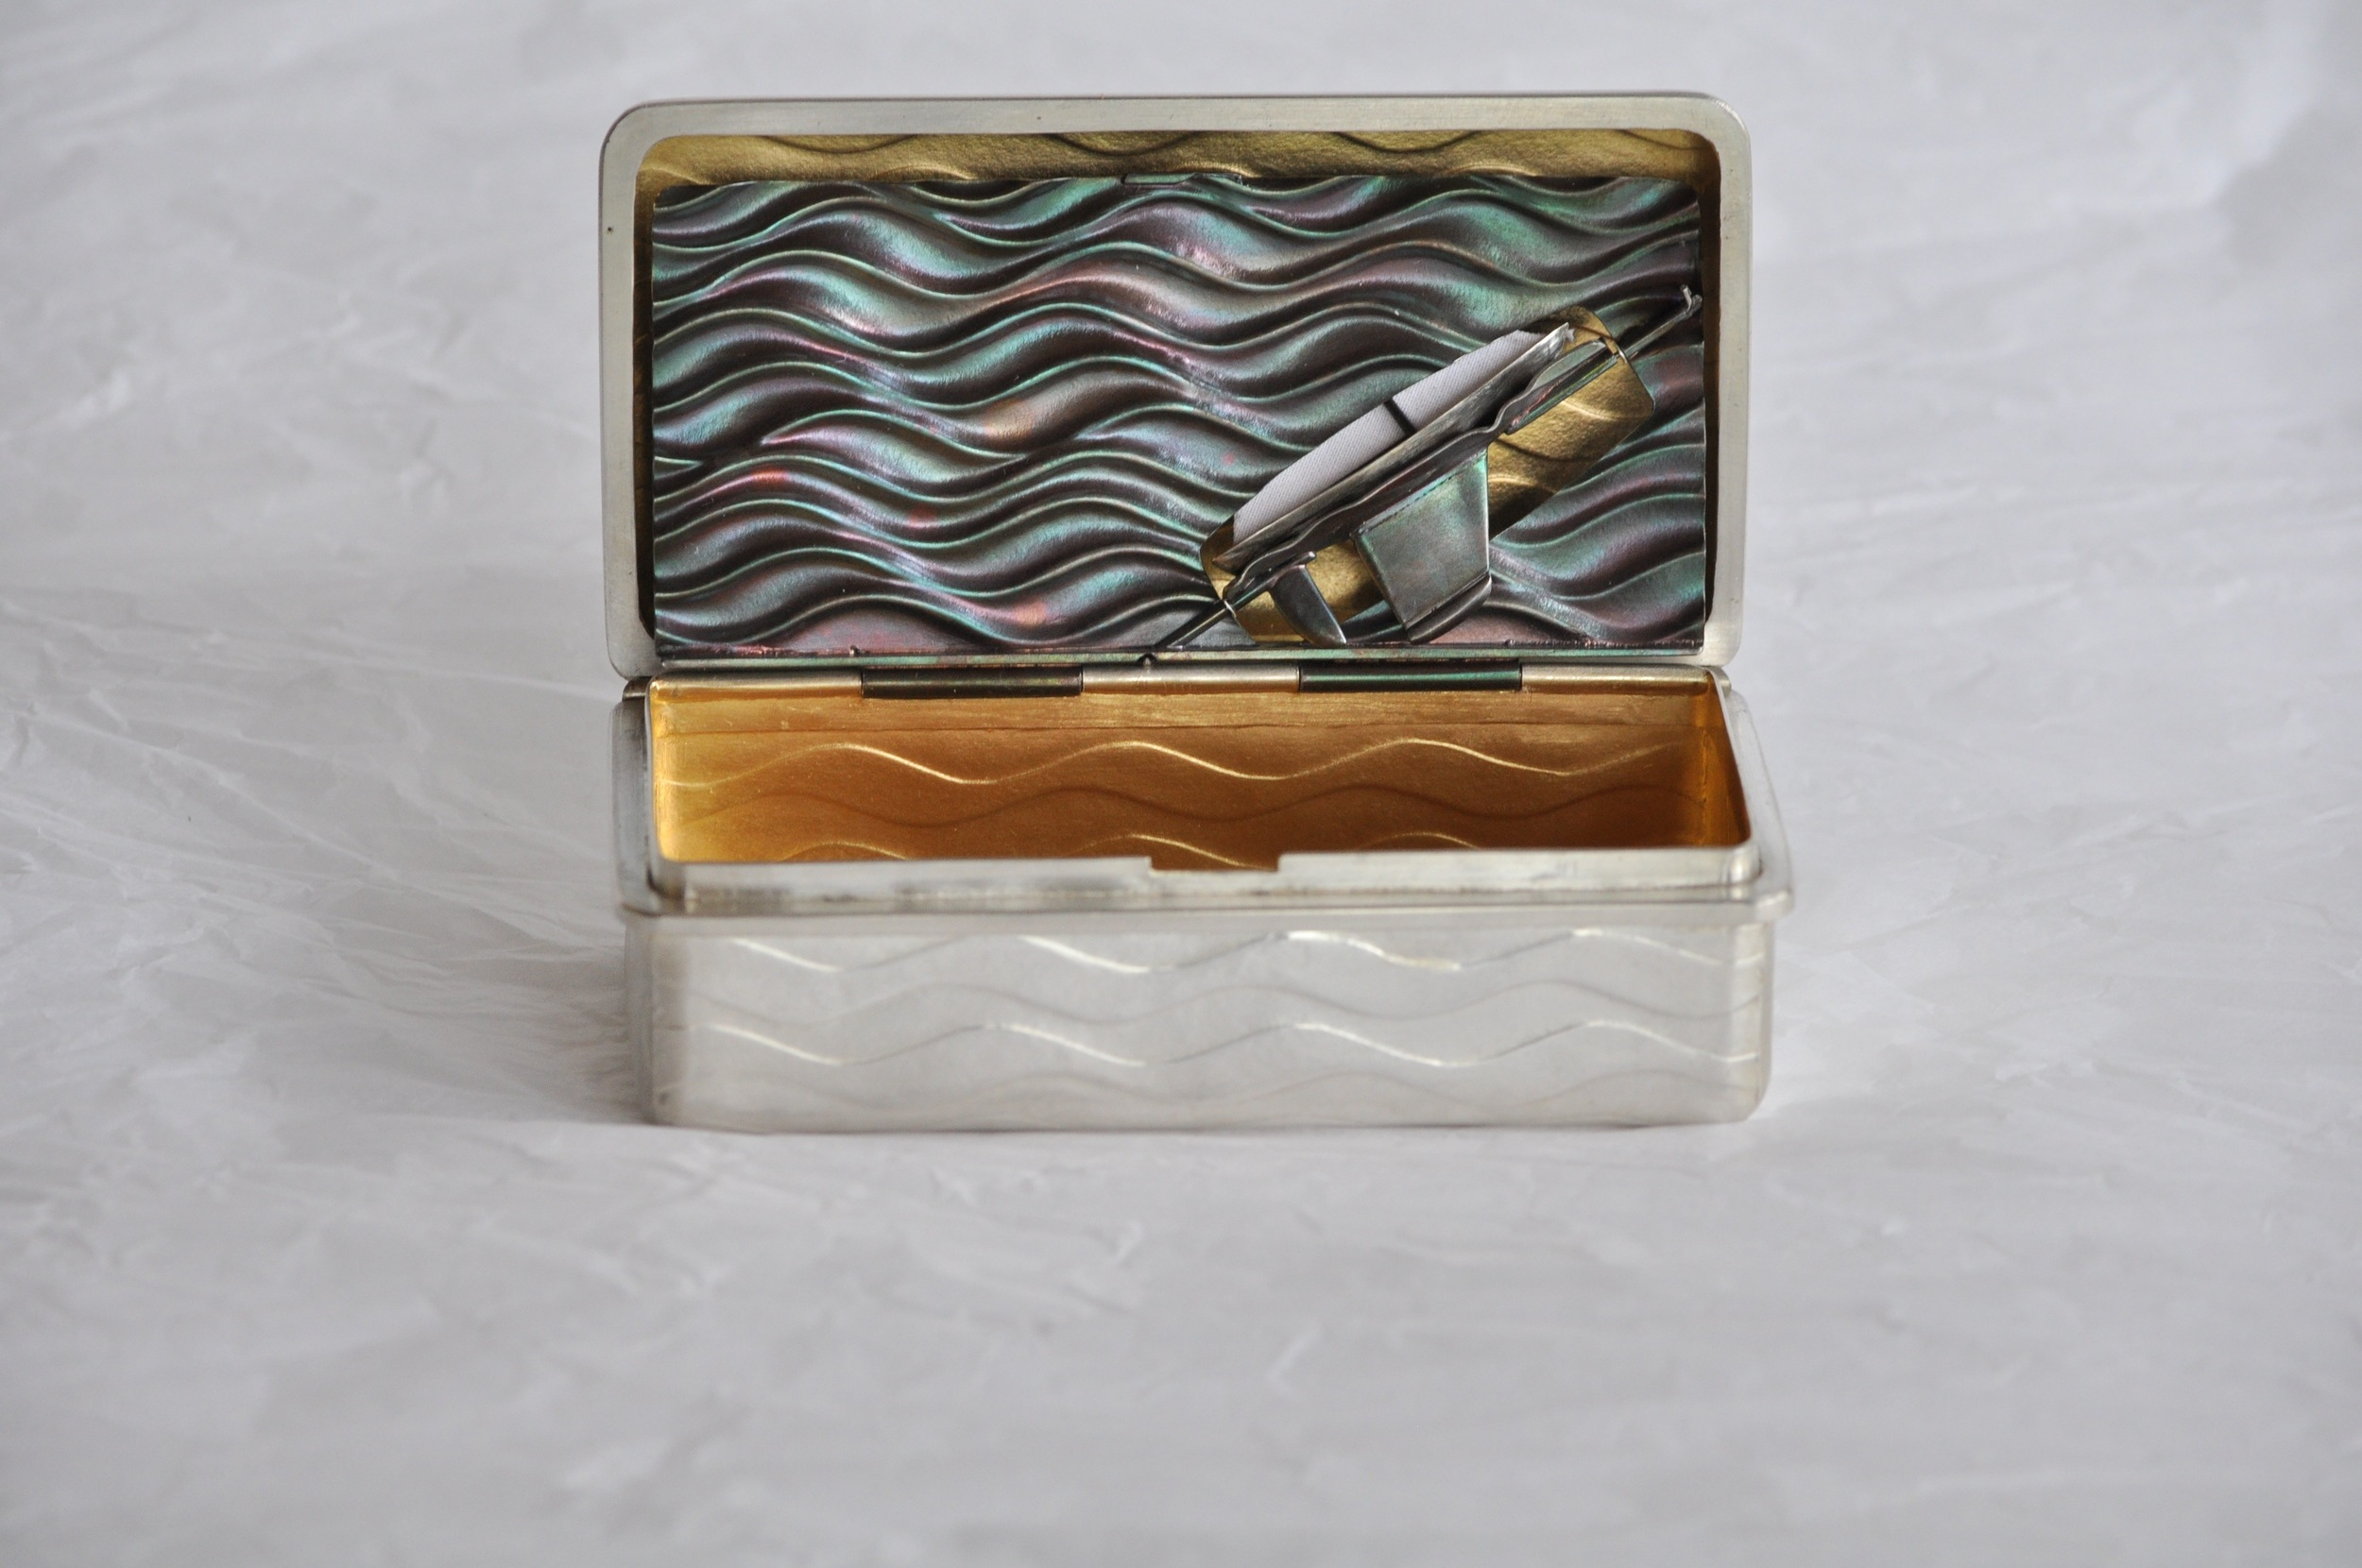 Snuffbox open inner lid up